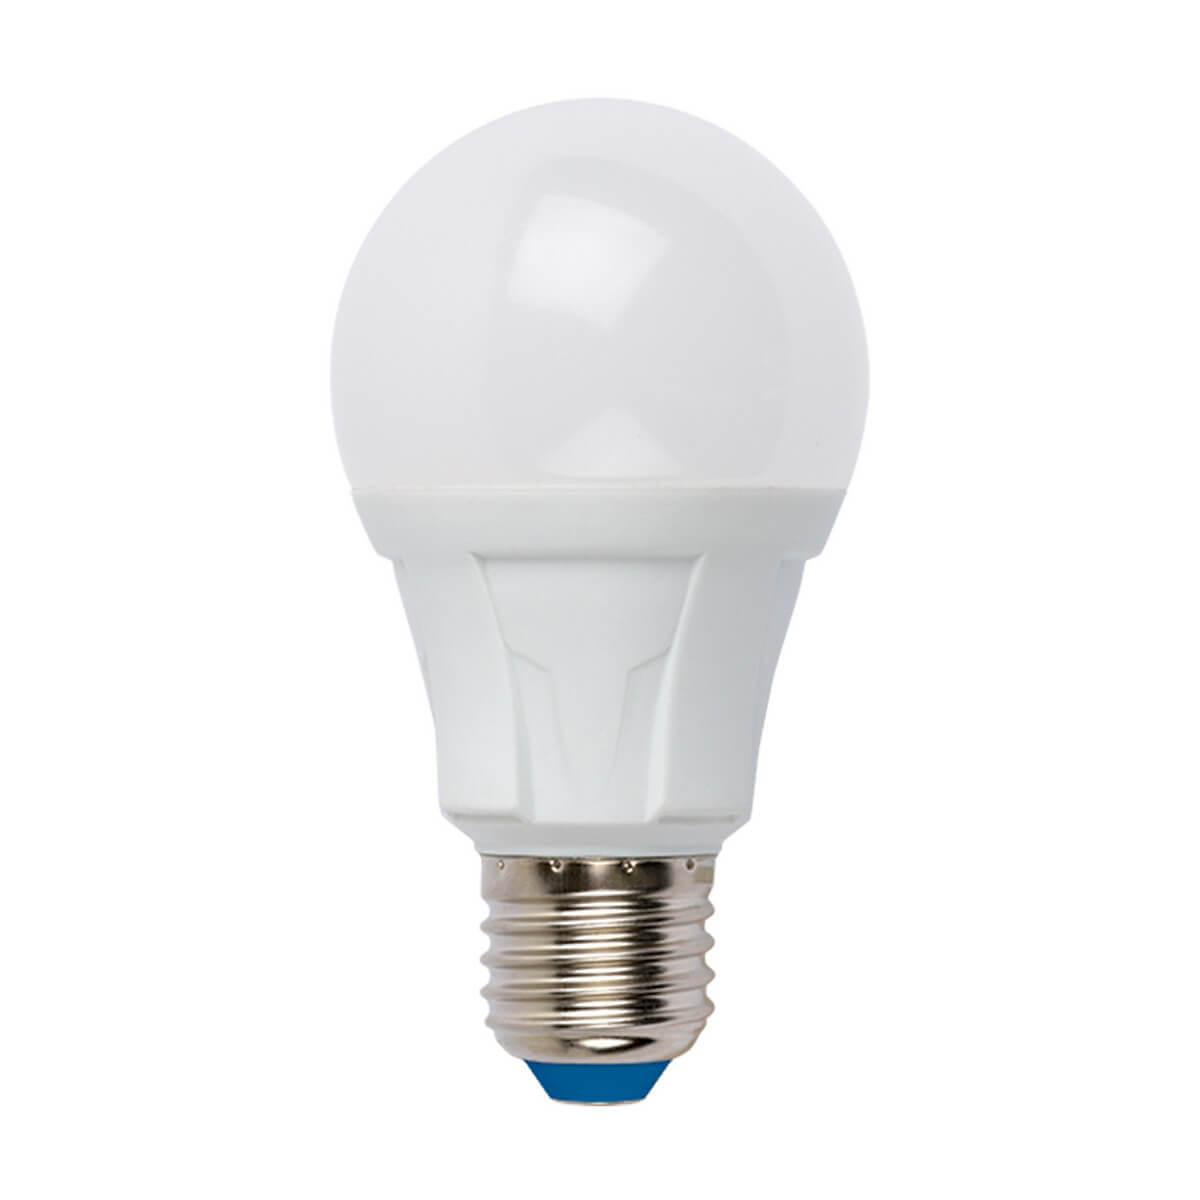 Лампа светодиодная диммируемая (UL-00004285) Uniel E27 10W 6500K матовая LED-A60 10W/6500K/E27/FR/DIM PLP01WH недорого